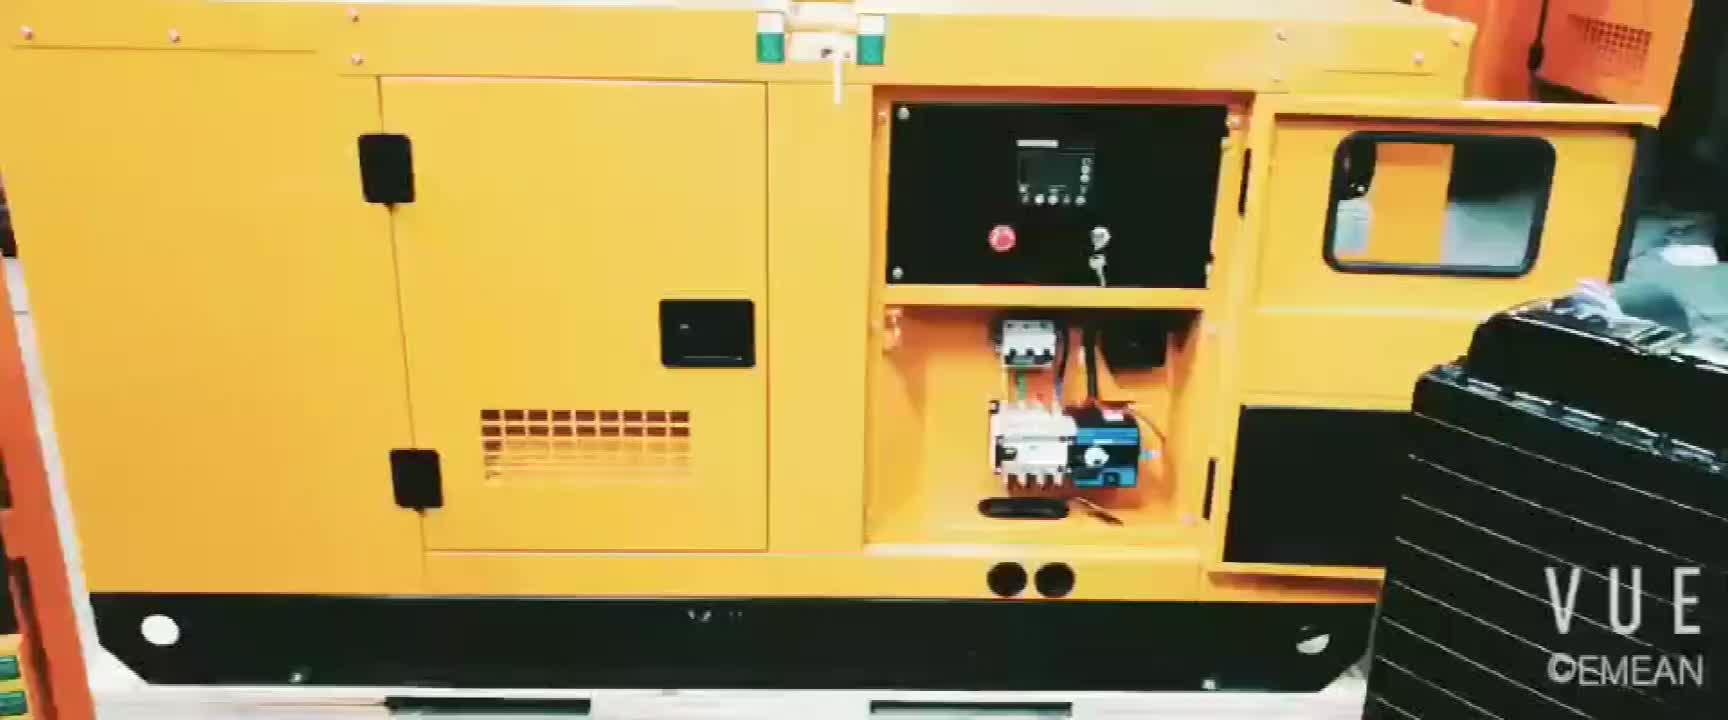 40 kva prezzo generatore generatore di 50 kva generatore diesel prezzo myanmar